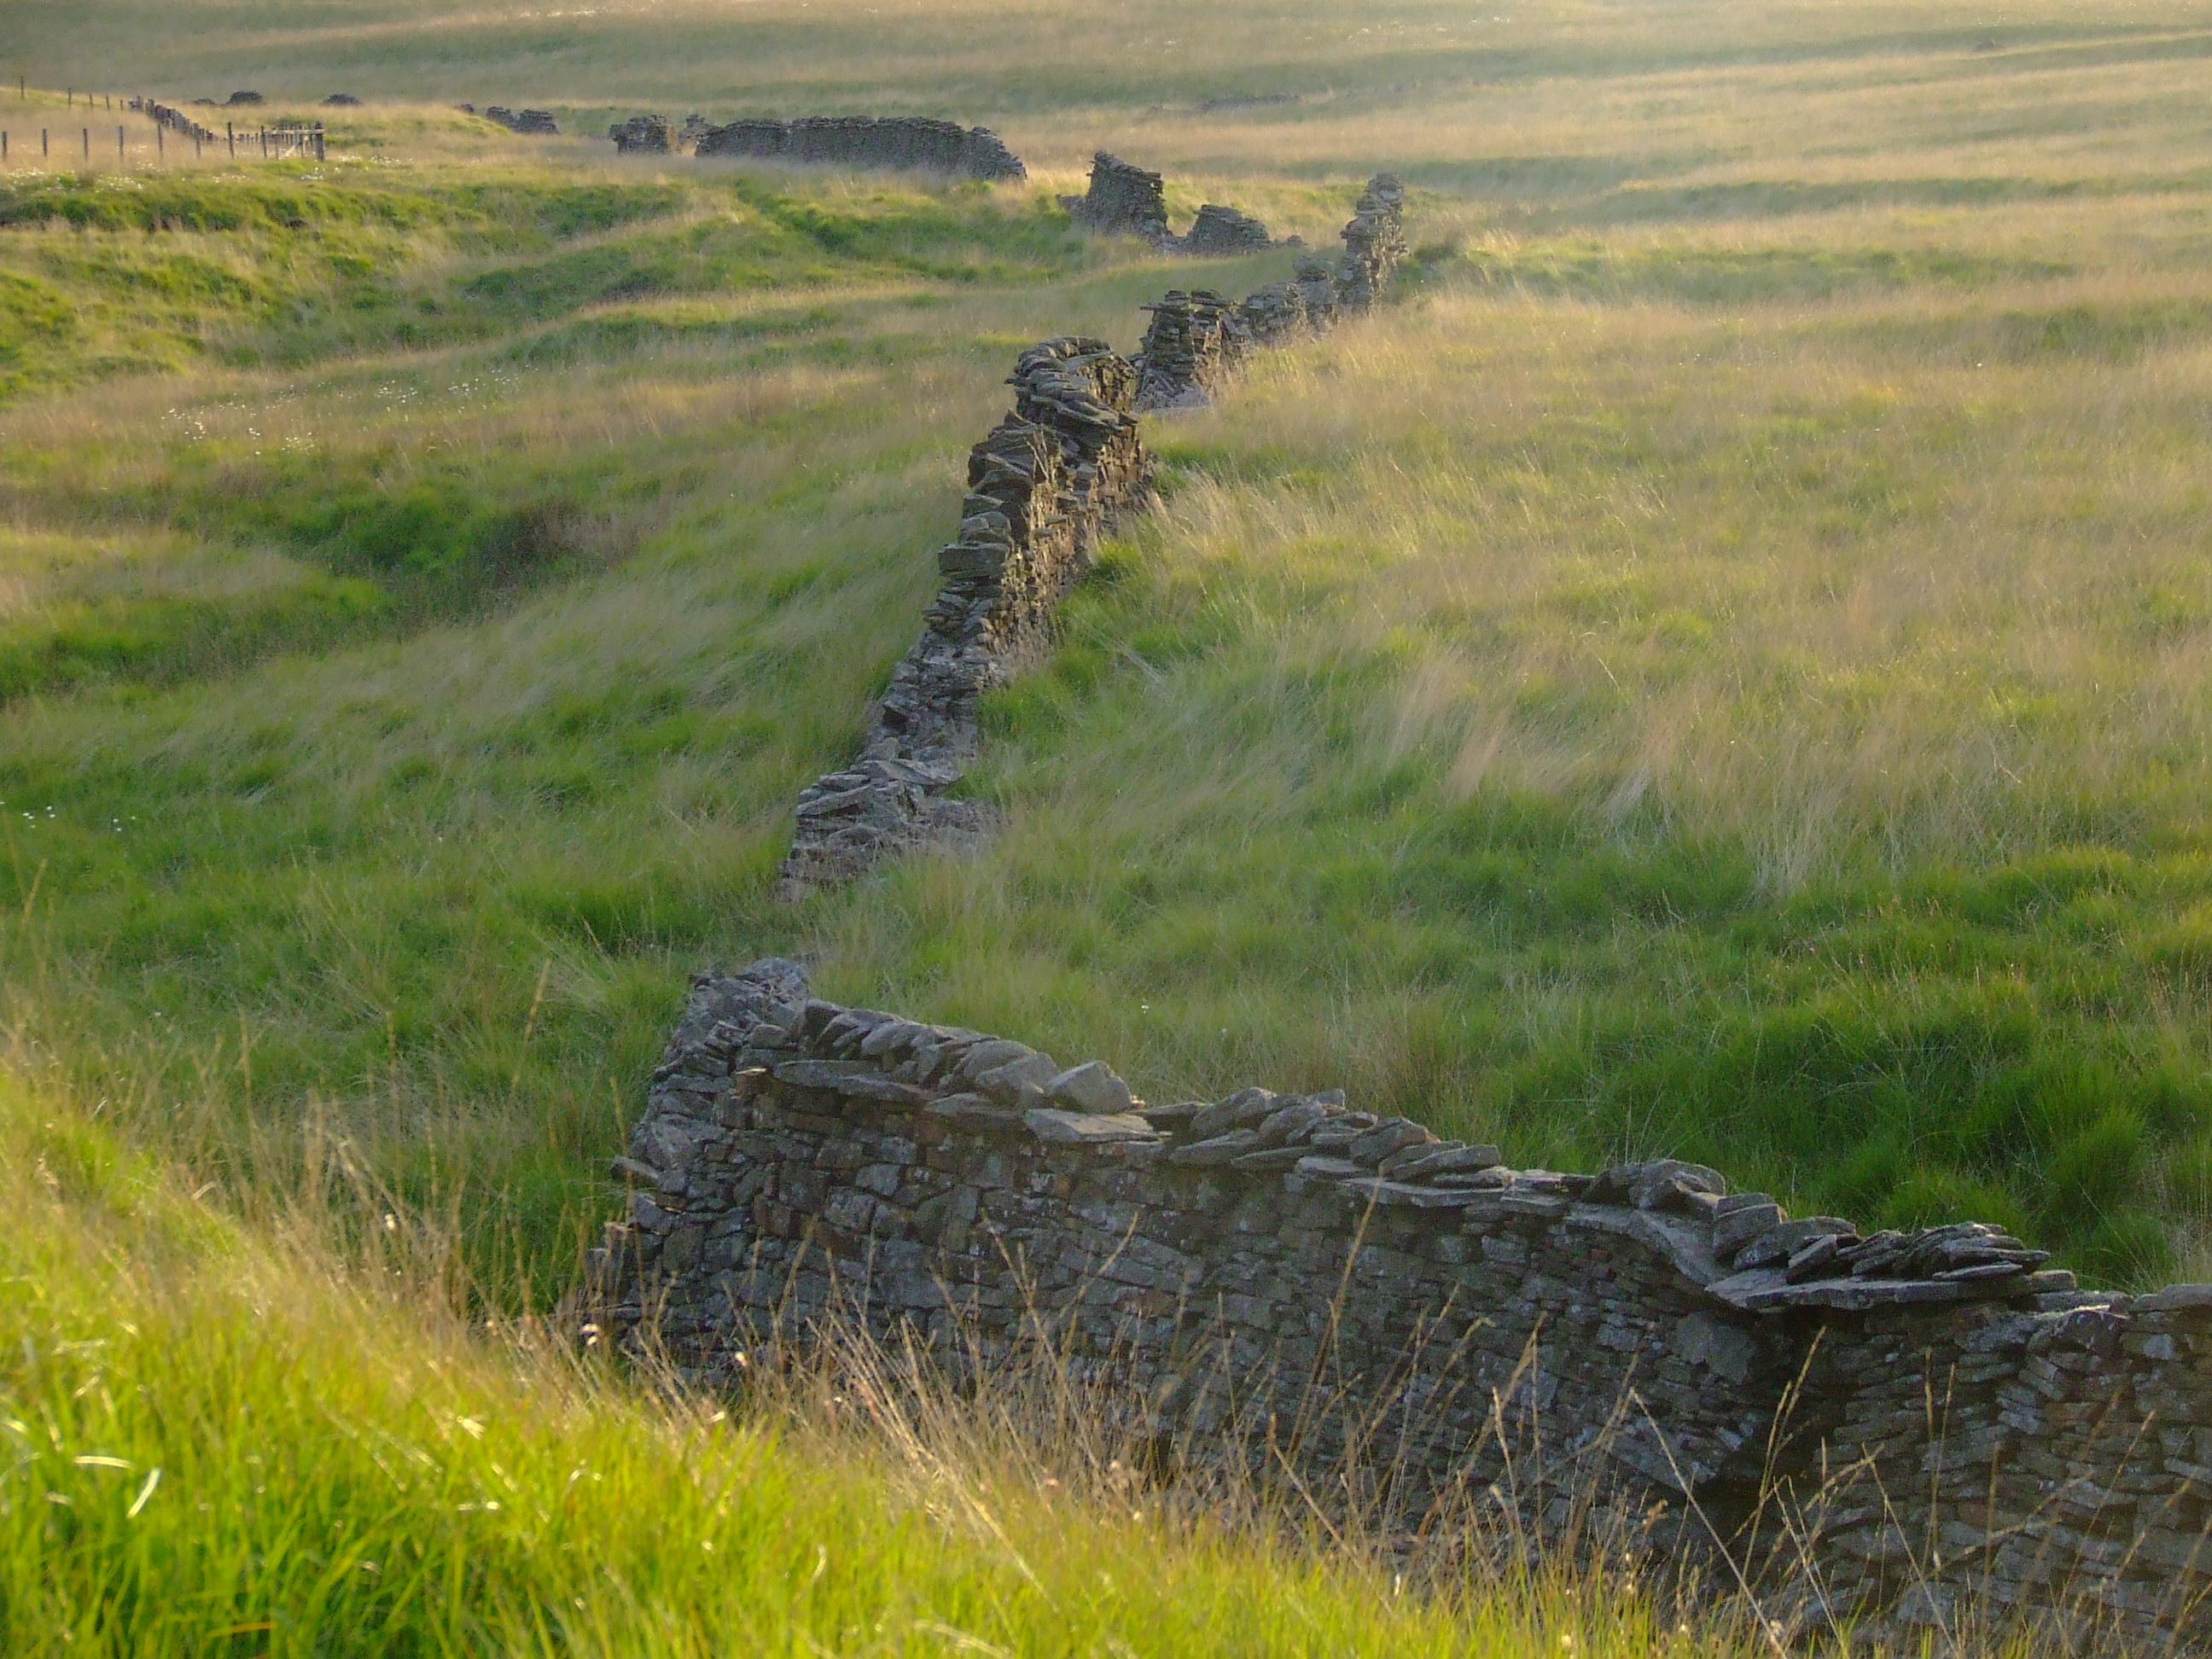 Dry_stone_wall_near_Calf_Hey_Brook,_West_Pennine_Moors_-_geograph.org.uk_-_1710989